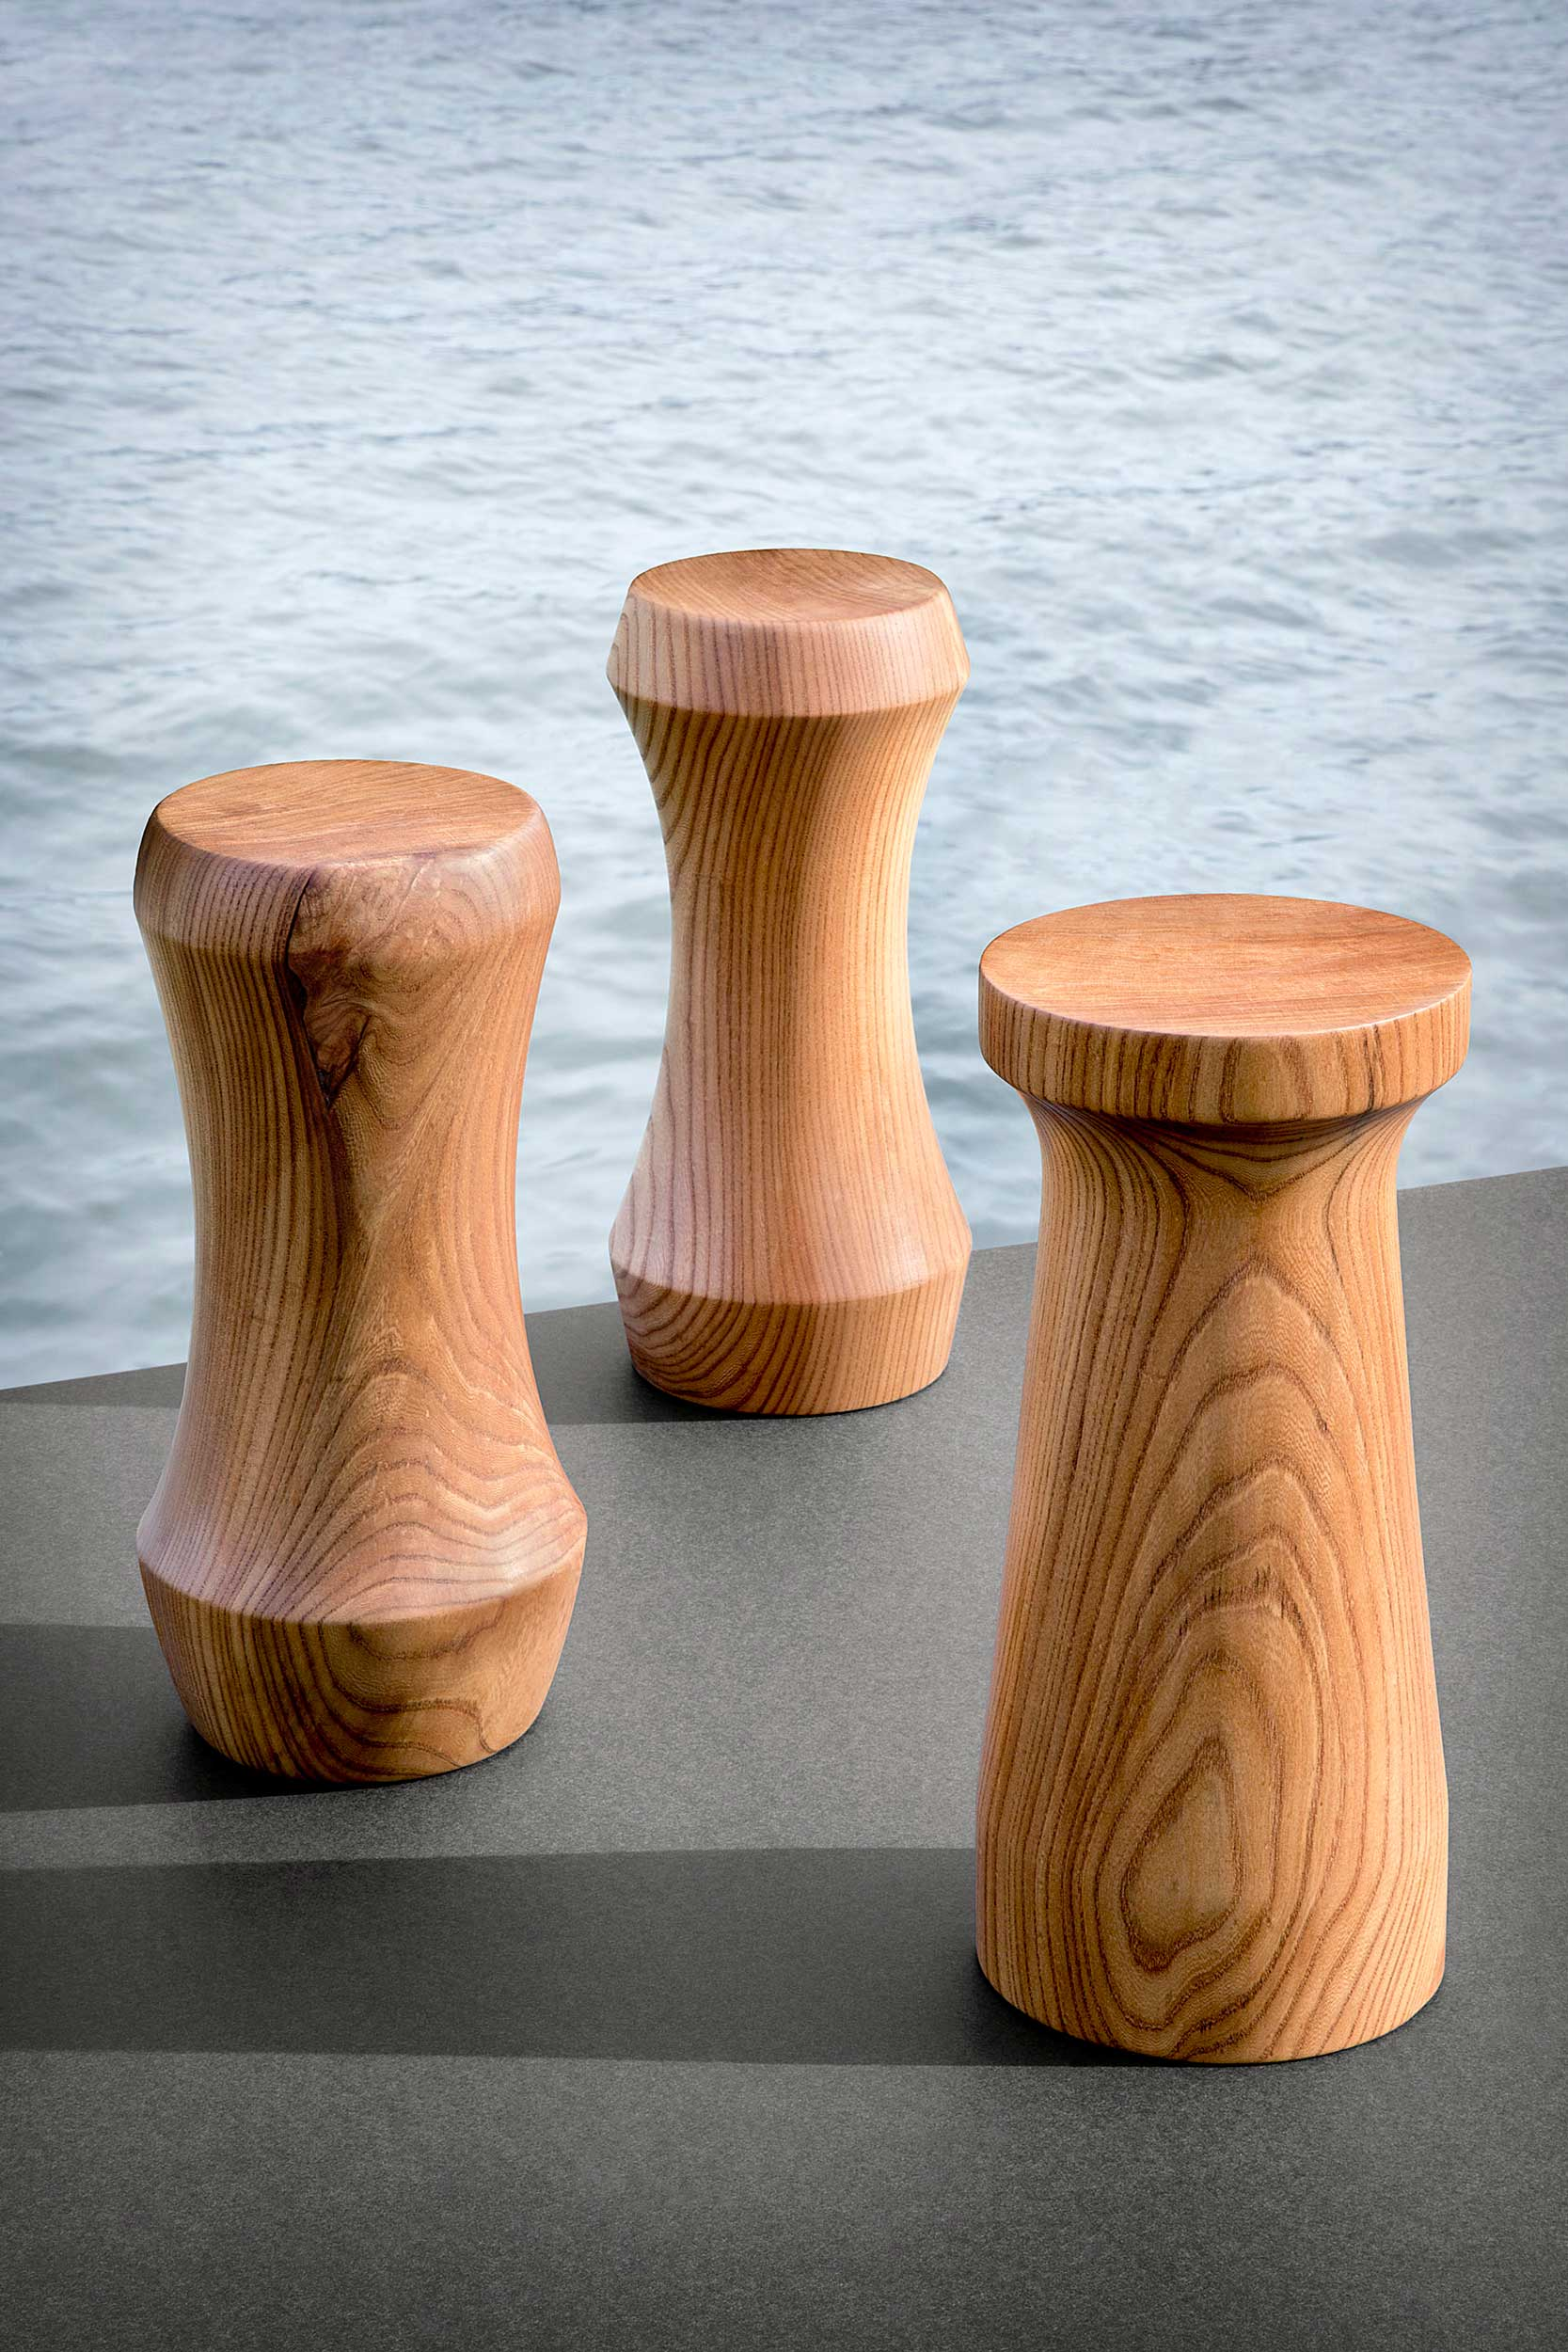 2-Turned-Tables-Grp-A.jpg